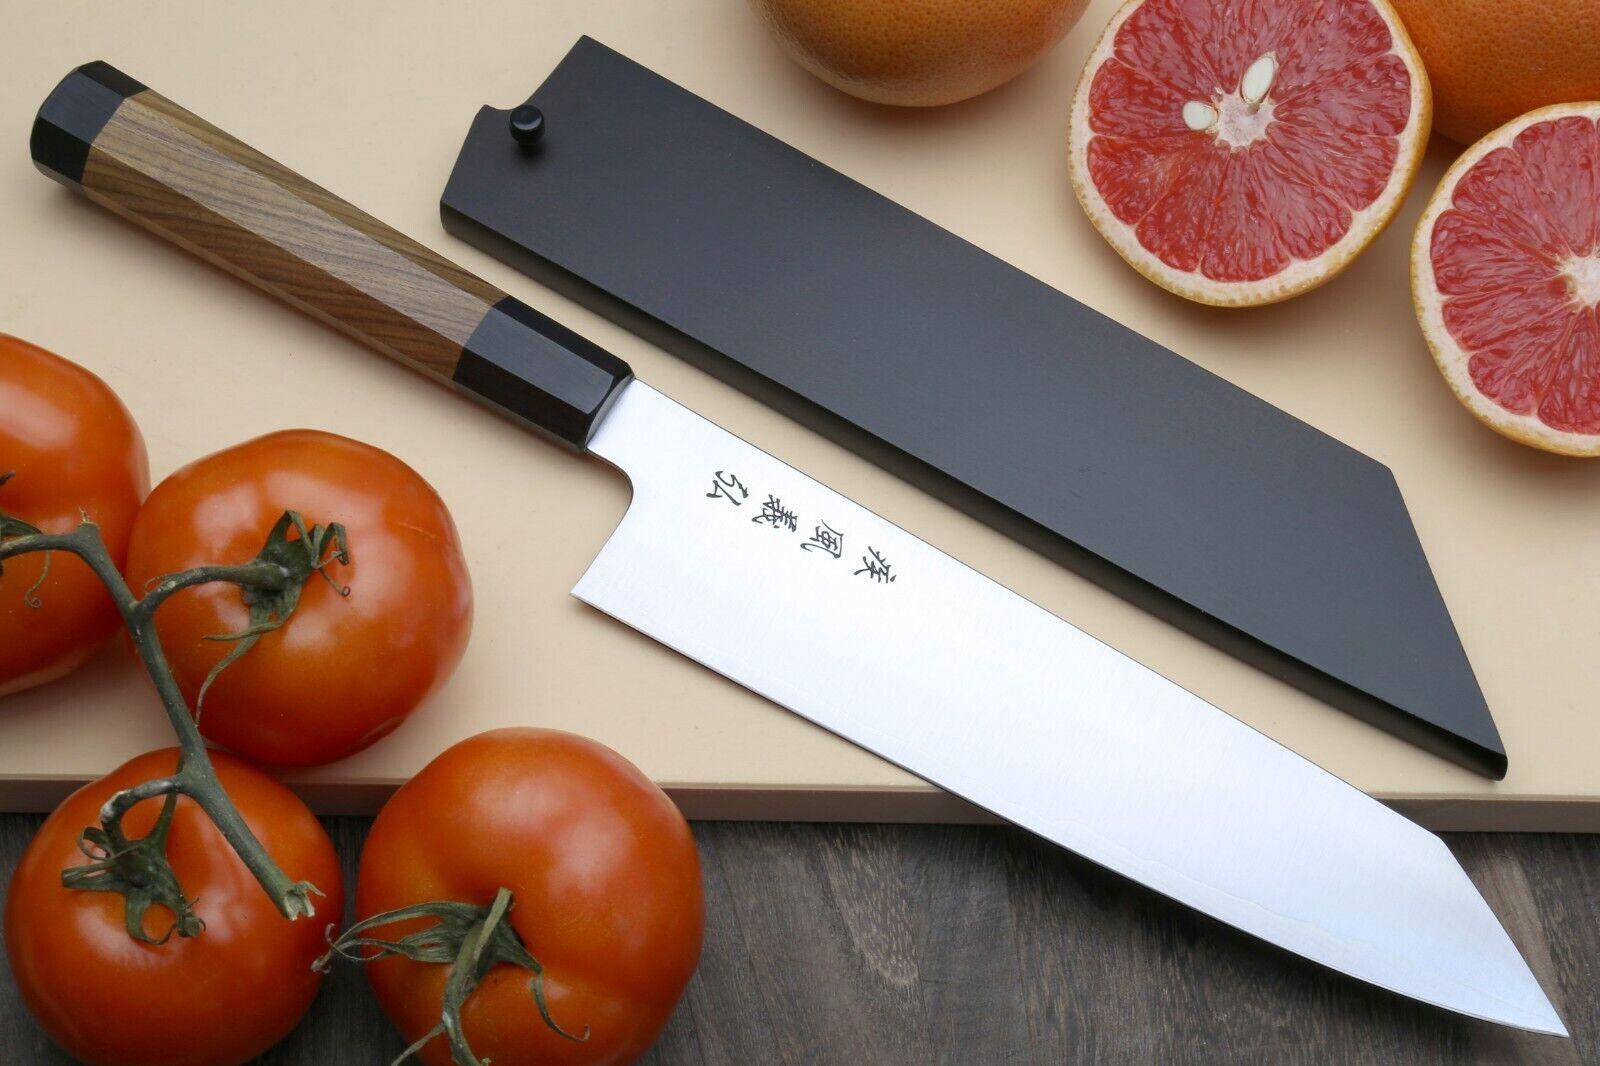 Yoshihiro SG-II (R-2) Semi-Inoxydable Kiritsuke japonais multifonction Chef Couteau